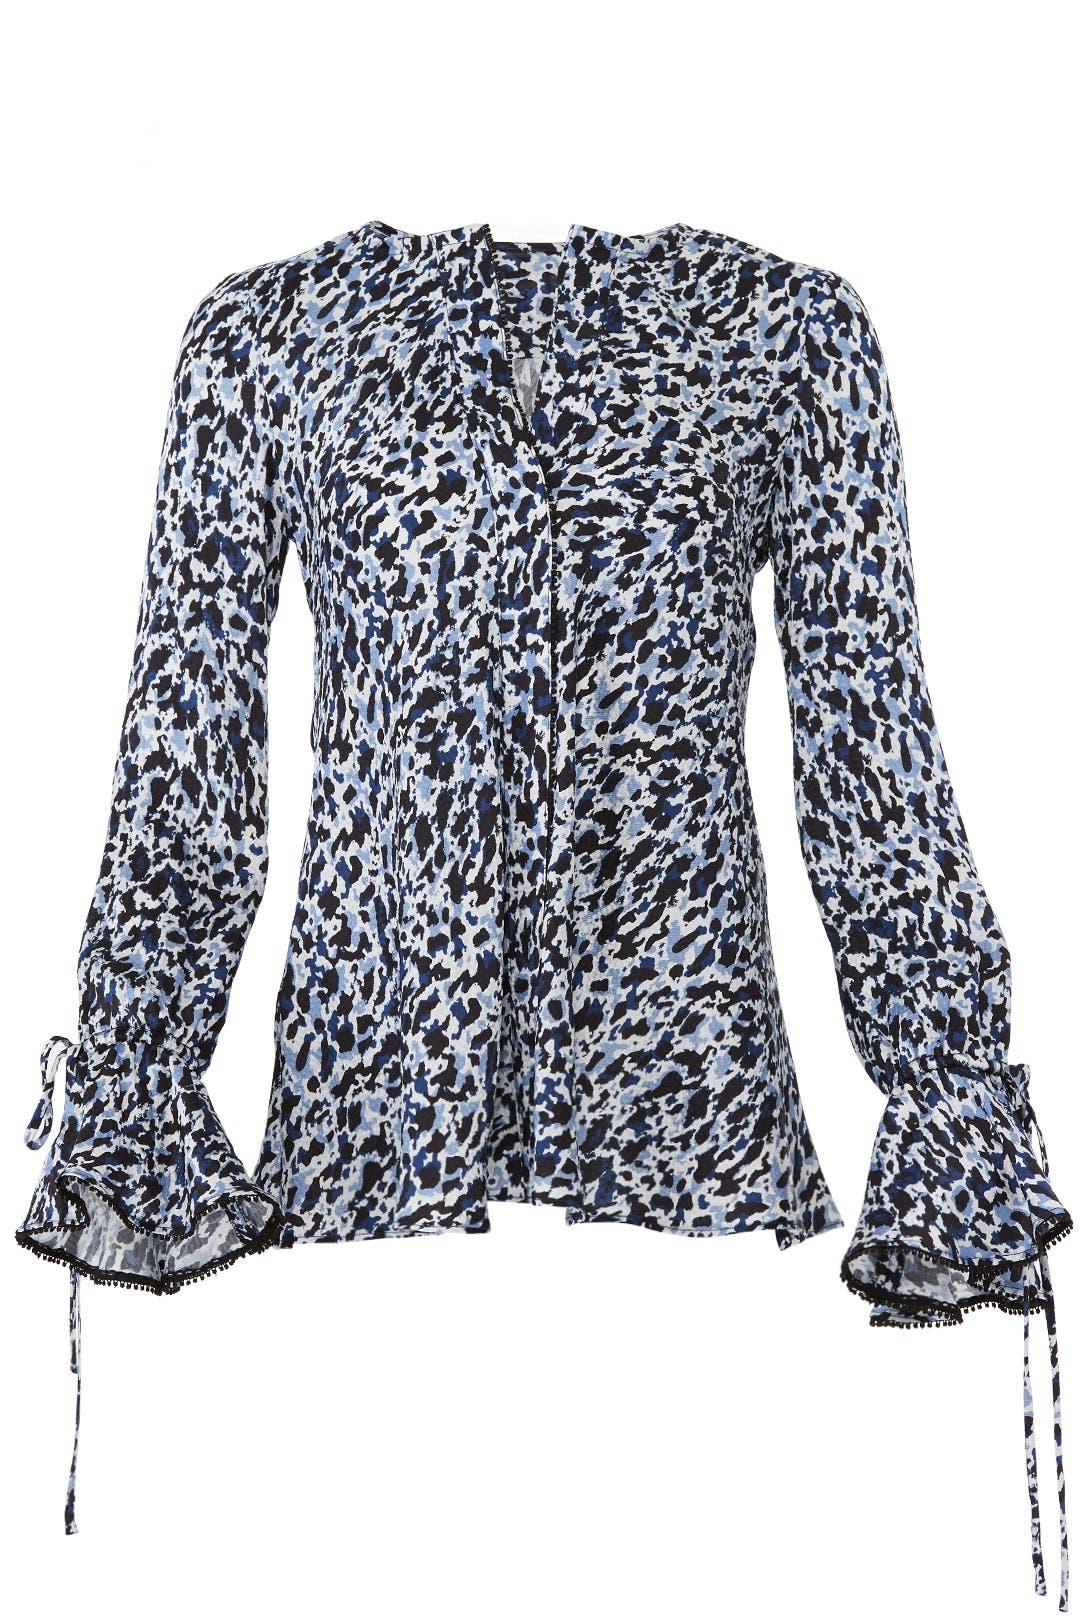 02a3c2f92ec48 Blue Leopard Print Blouse by Derek Lam 10 Crosby for  55